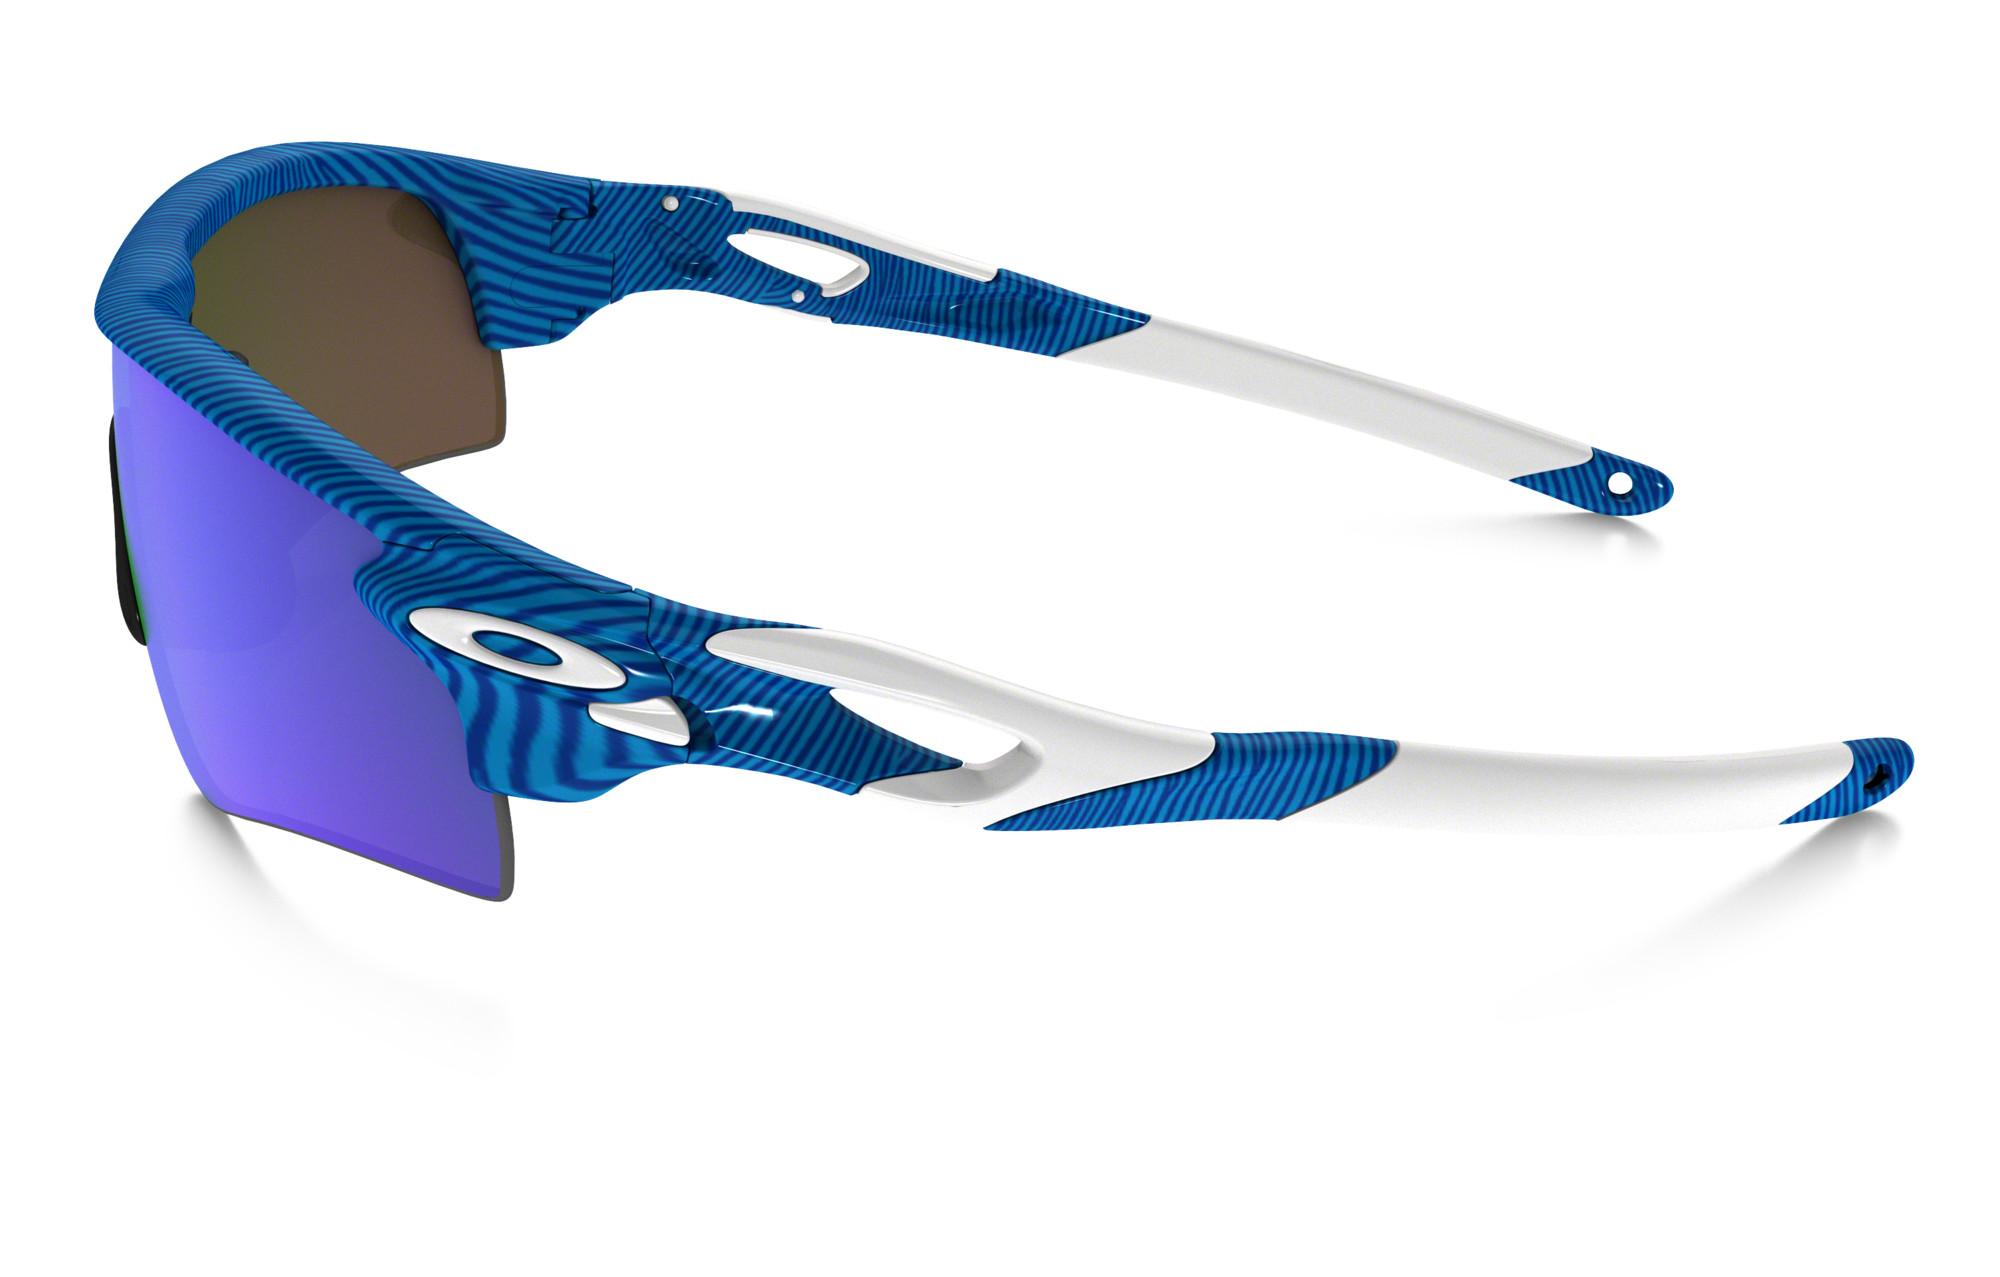 Paire Bleusapphire Lunettes Oakley Path Iridium Oo9181 Fingerprint Réf Radarlock 46 De P0wn8kO